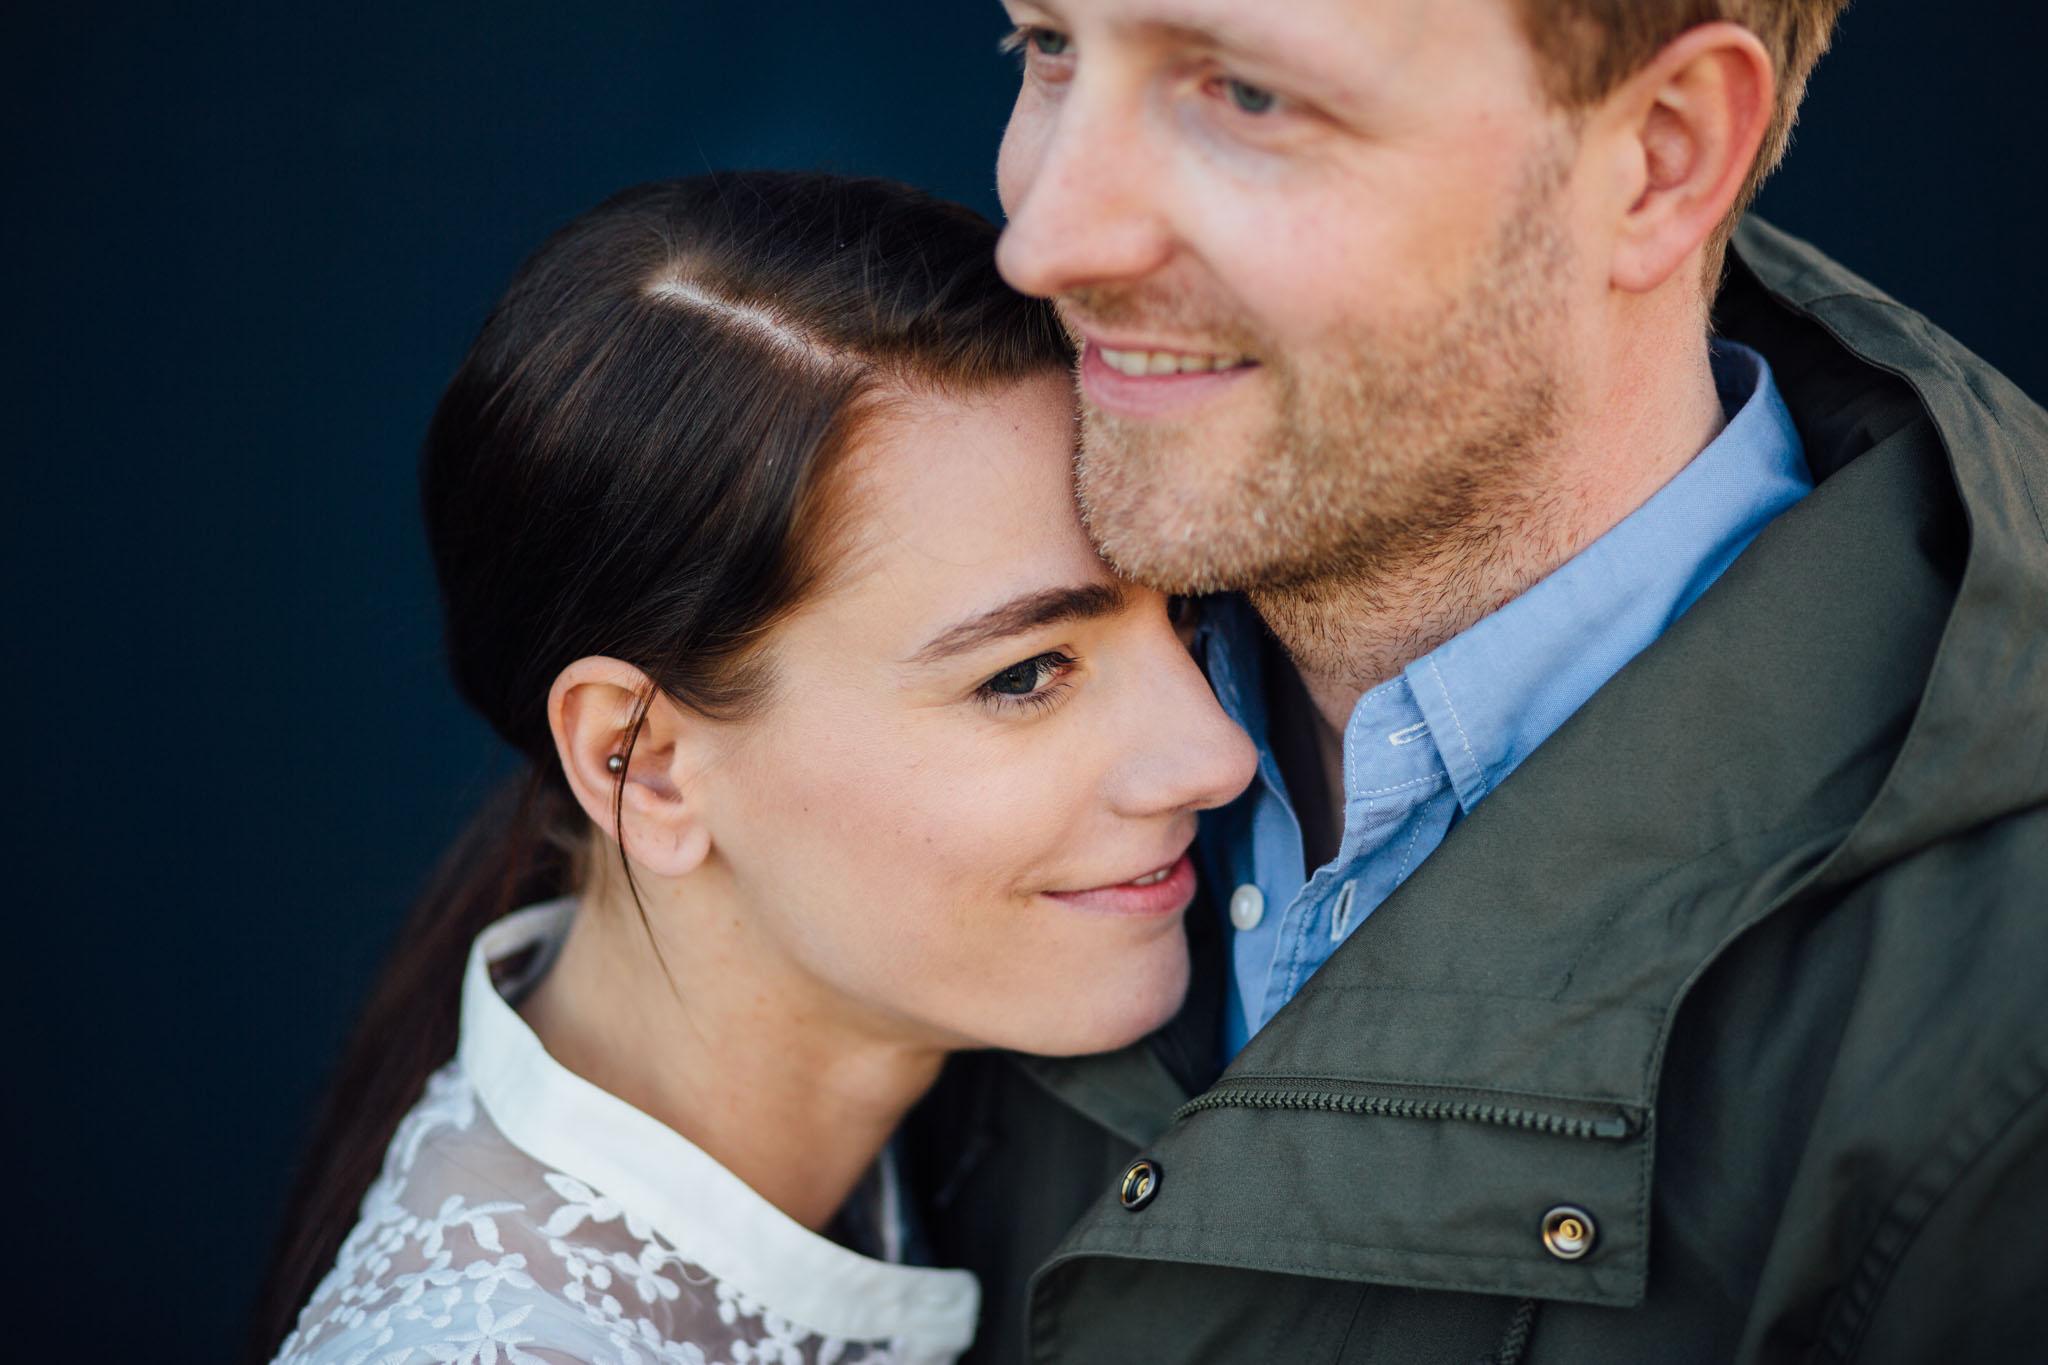 hochzeitsfotograf-verlobungsfotos-paarshoot-berlin